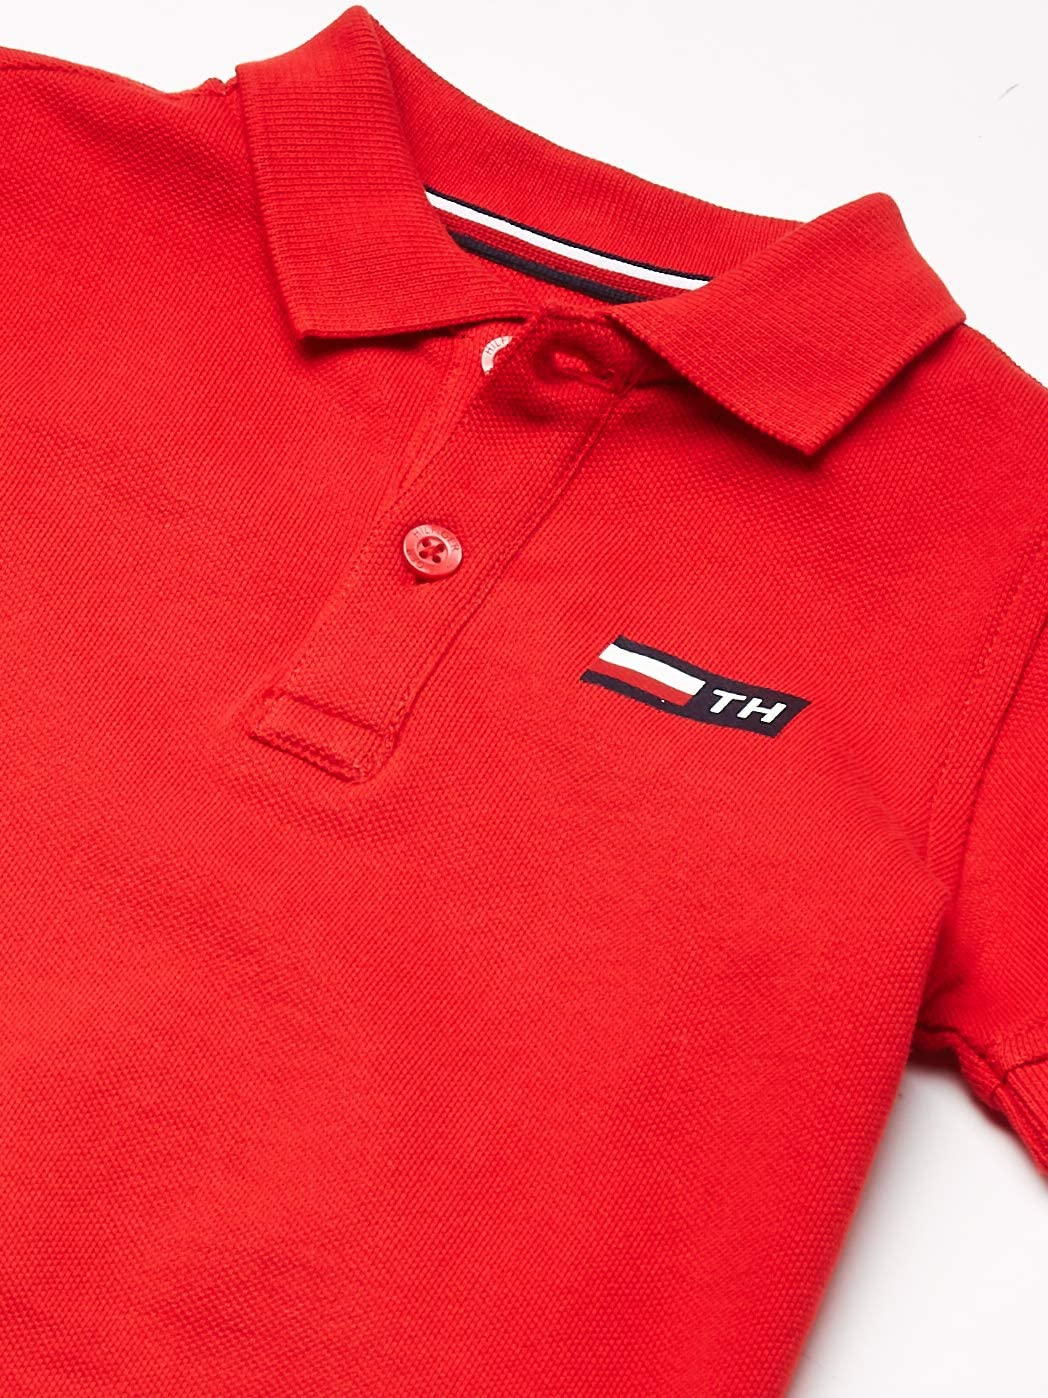 Tommy Hilfiger Baby Girl Rugby Stripe Dress S//S Blusa para Beb/és